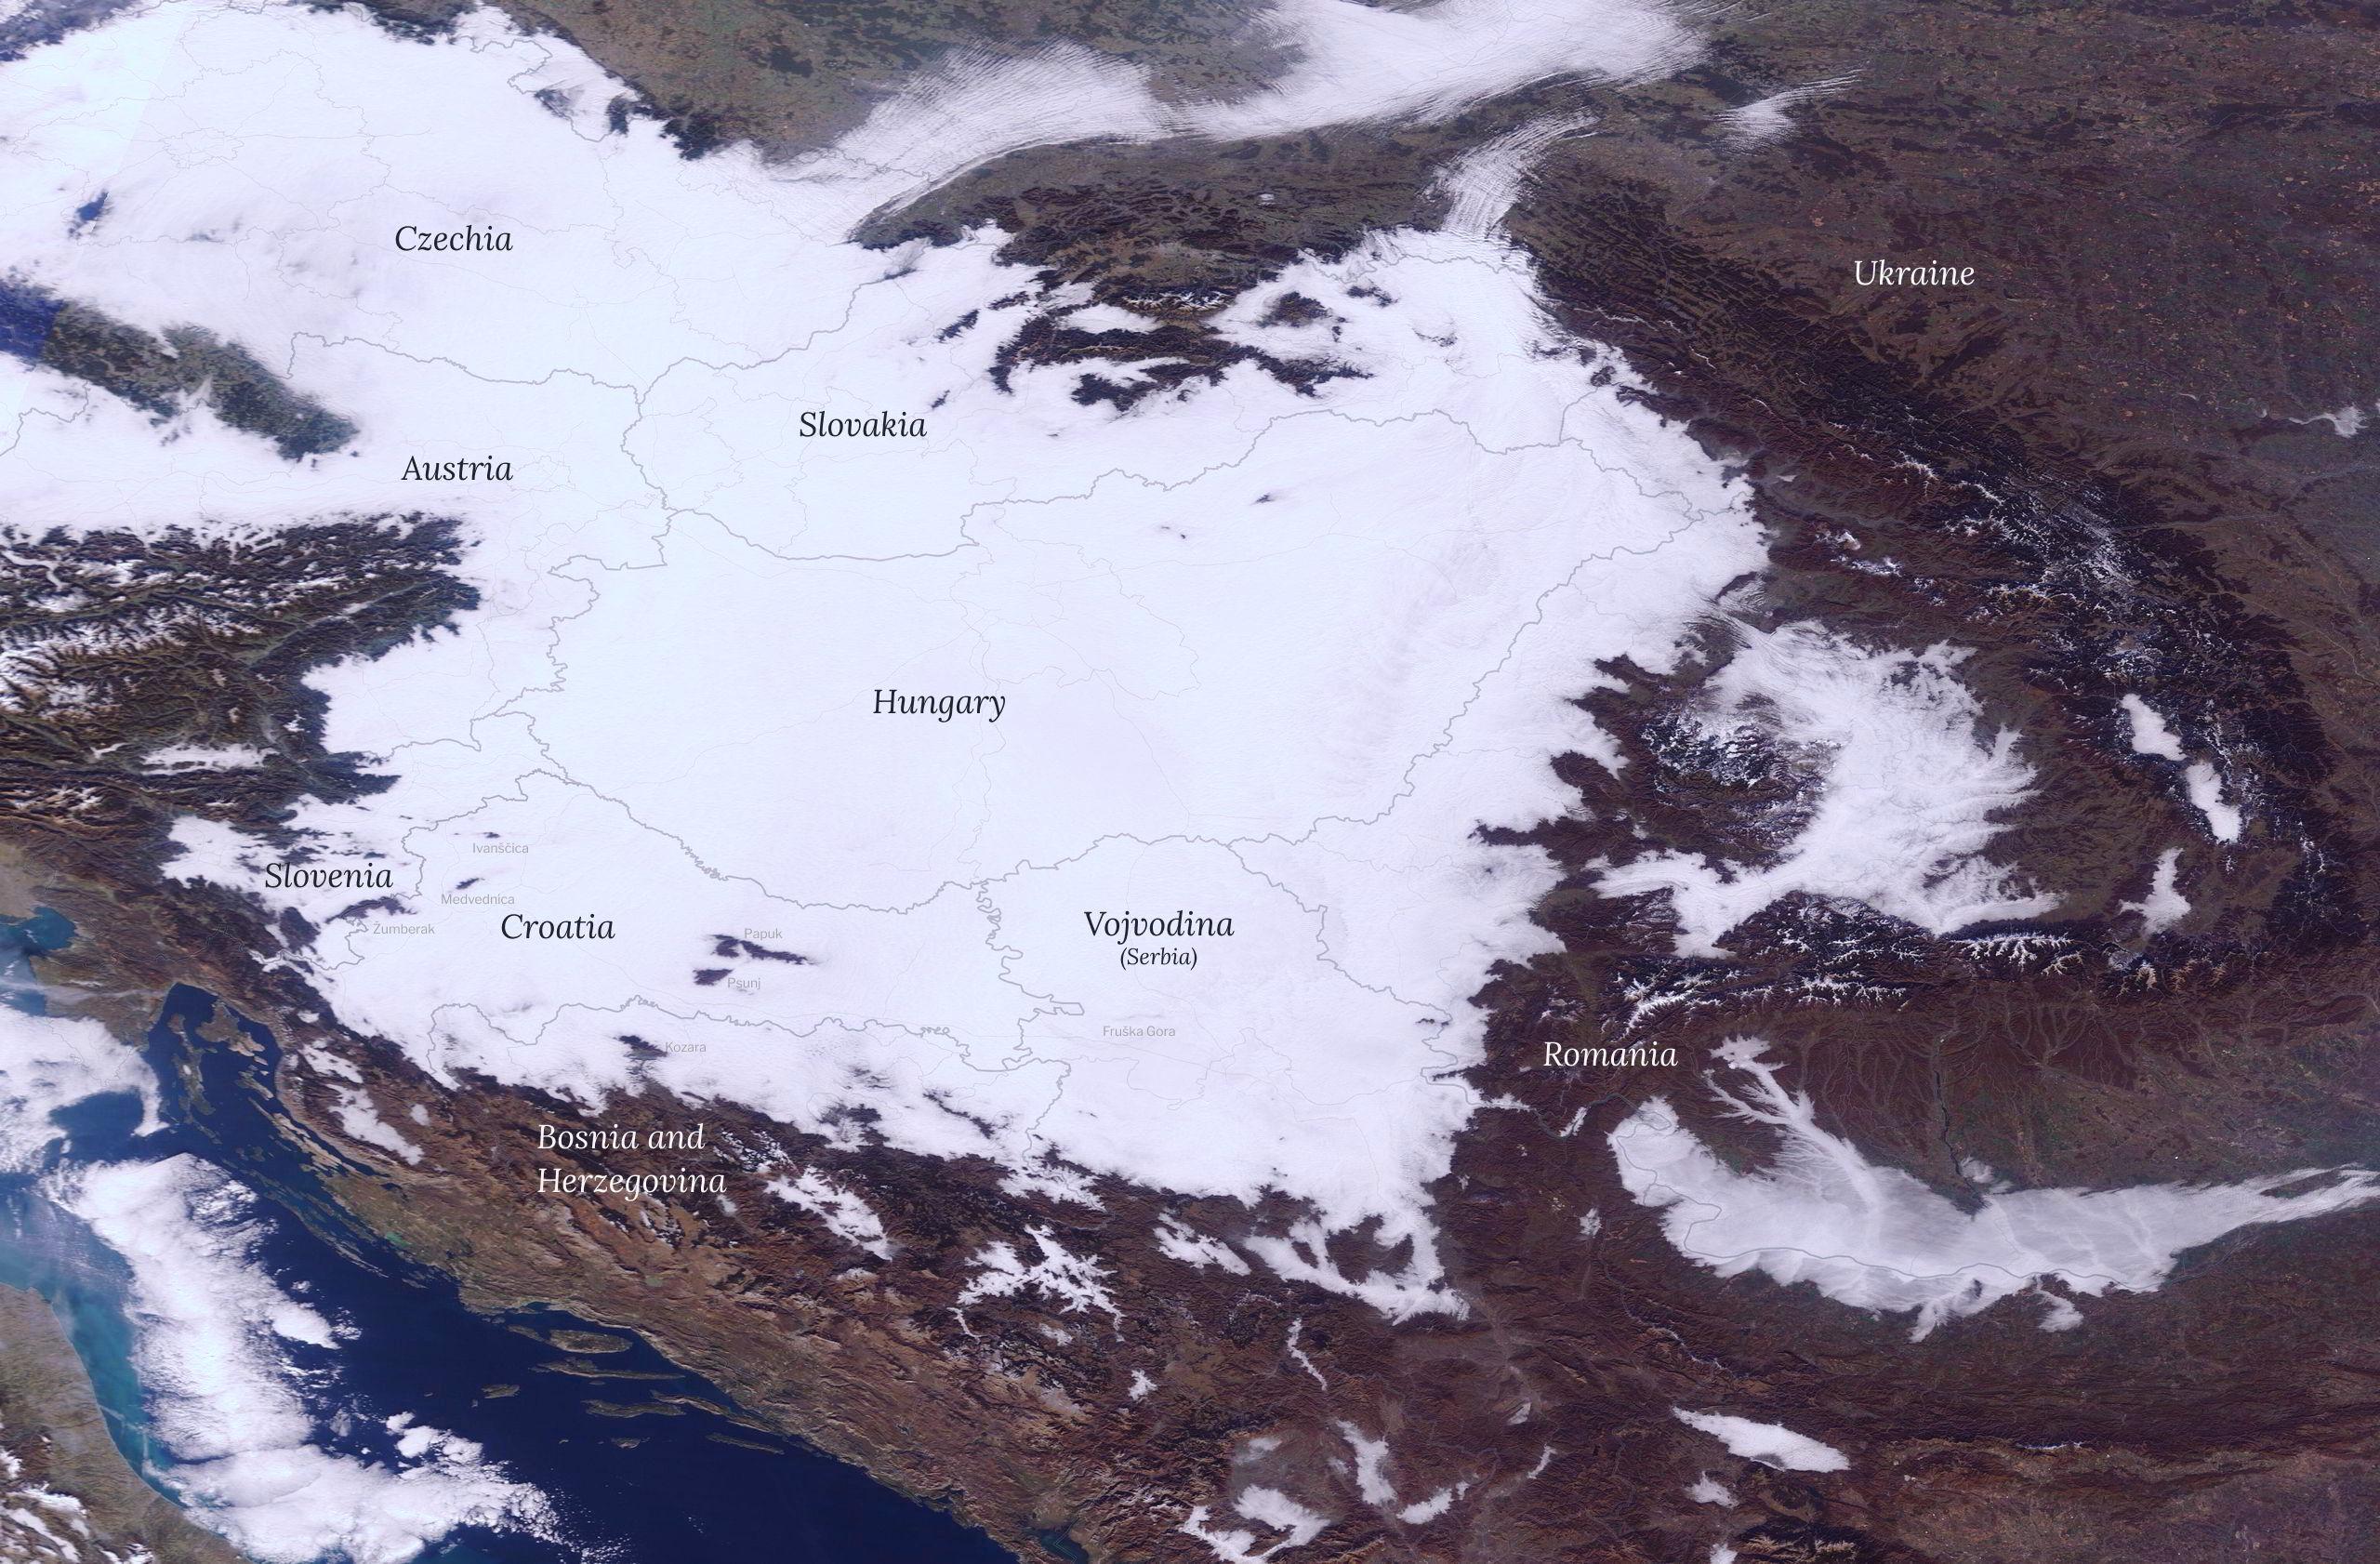 Vrhovi gorja iznad magle i niskih oblaka ocrtavaju otoke nestalog Panonskog mora.